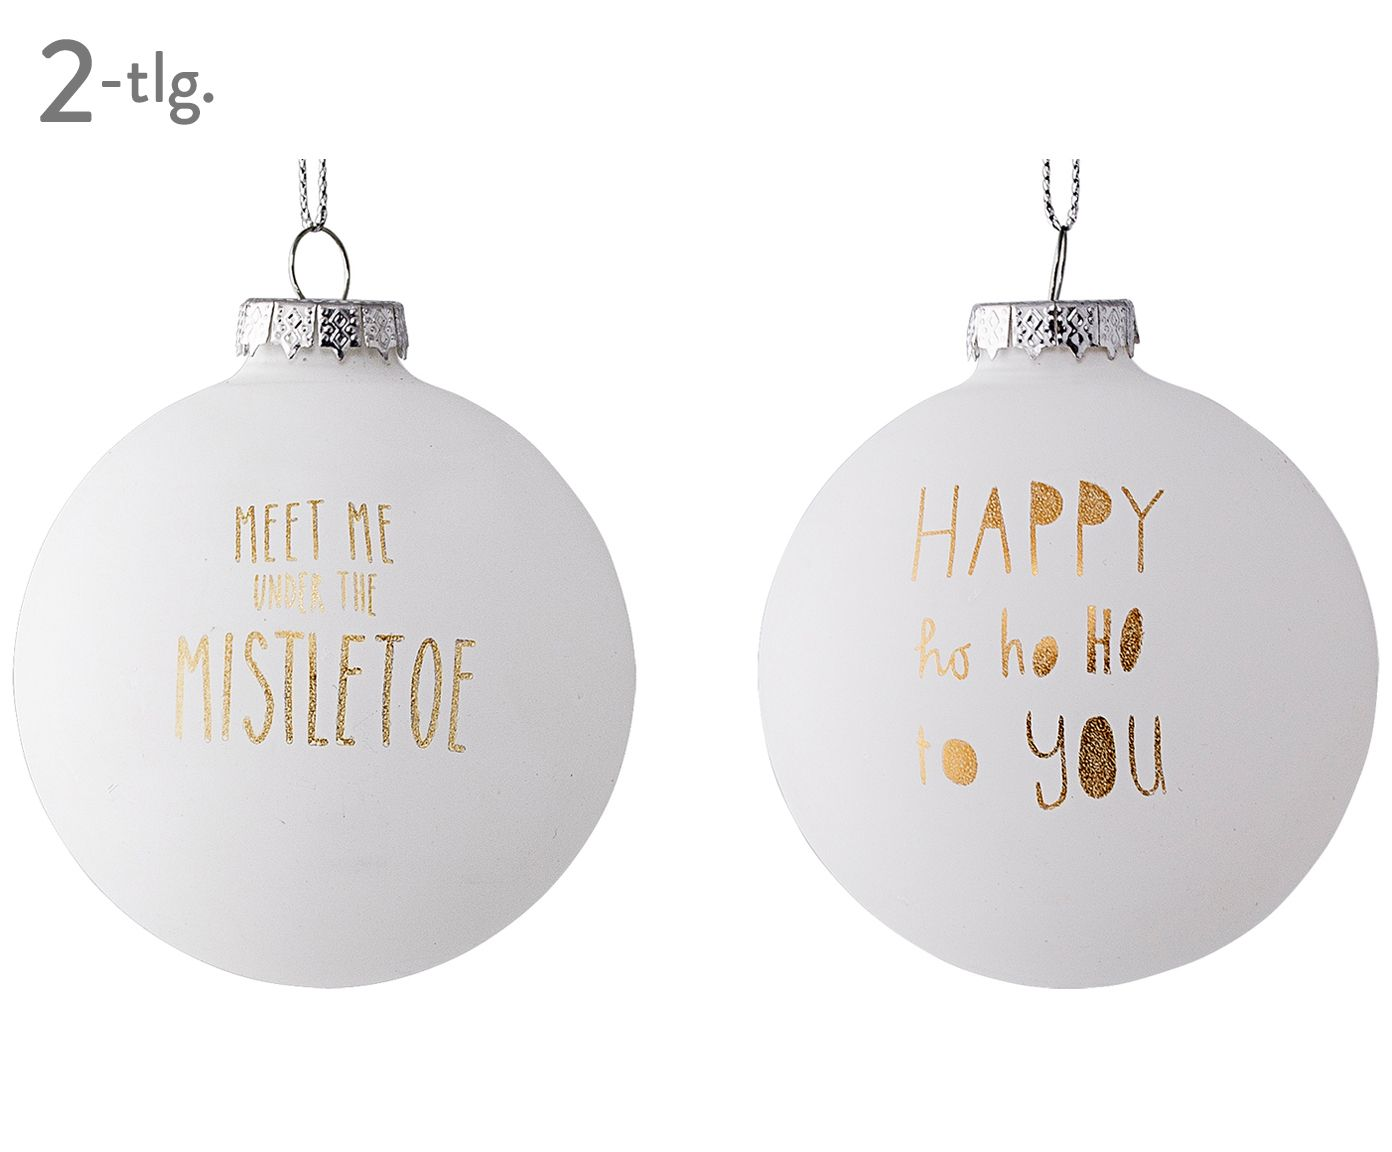 weihnachtskugel set mistletoe 2 tlg kr schtdag christmas christmas decorations und xmas. Black Bedroom Furniture Sets. Home Design Ideas